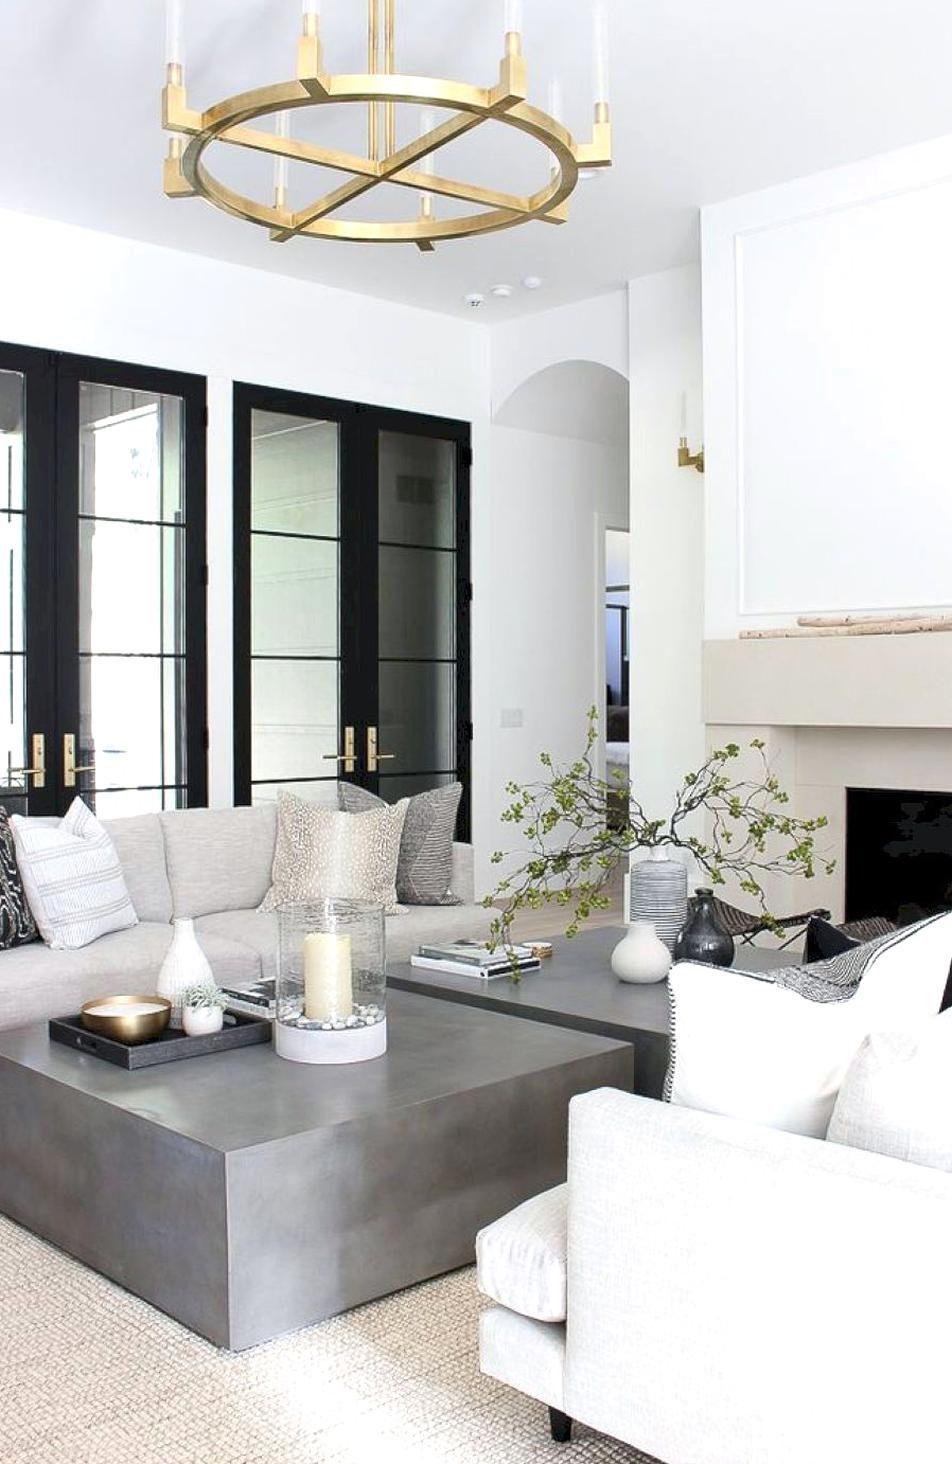 Obtain More Astonishing Scandinavian Living Rooms Minimalist Ideas 42 39 Fancy In 2020 Minimalist Living Room Living Room Scandinavian Scandinavian Design Living Room